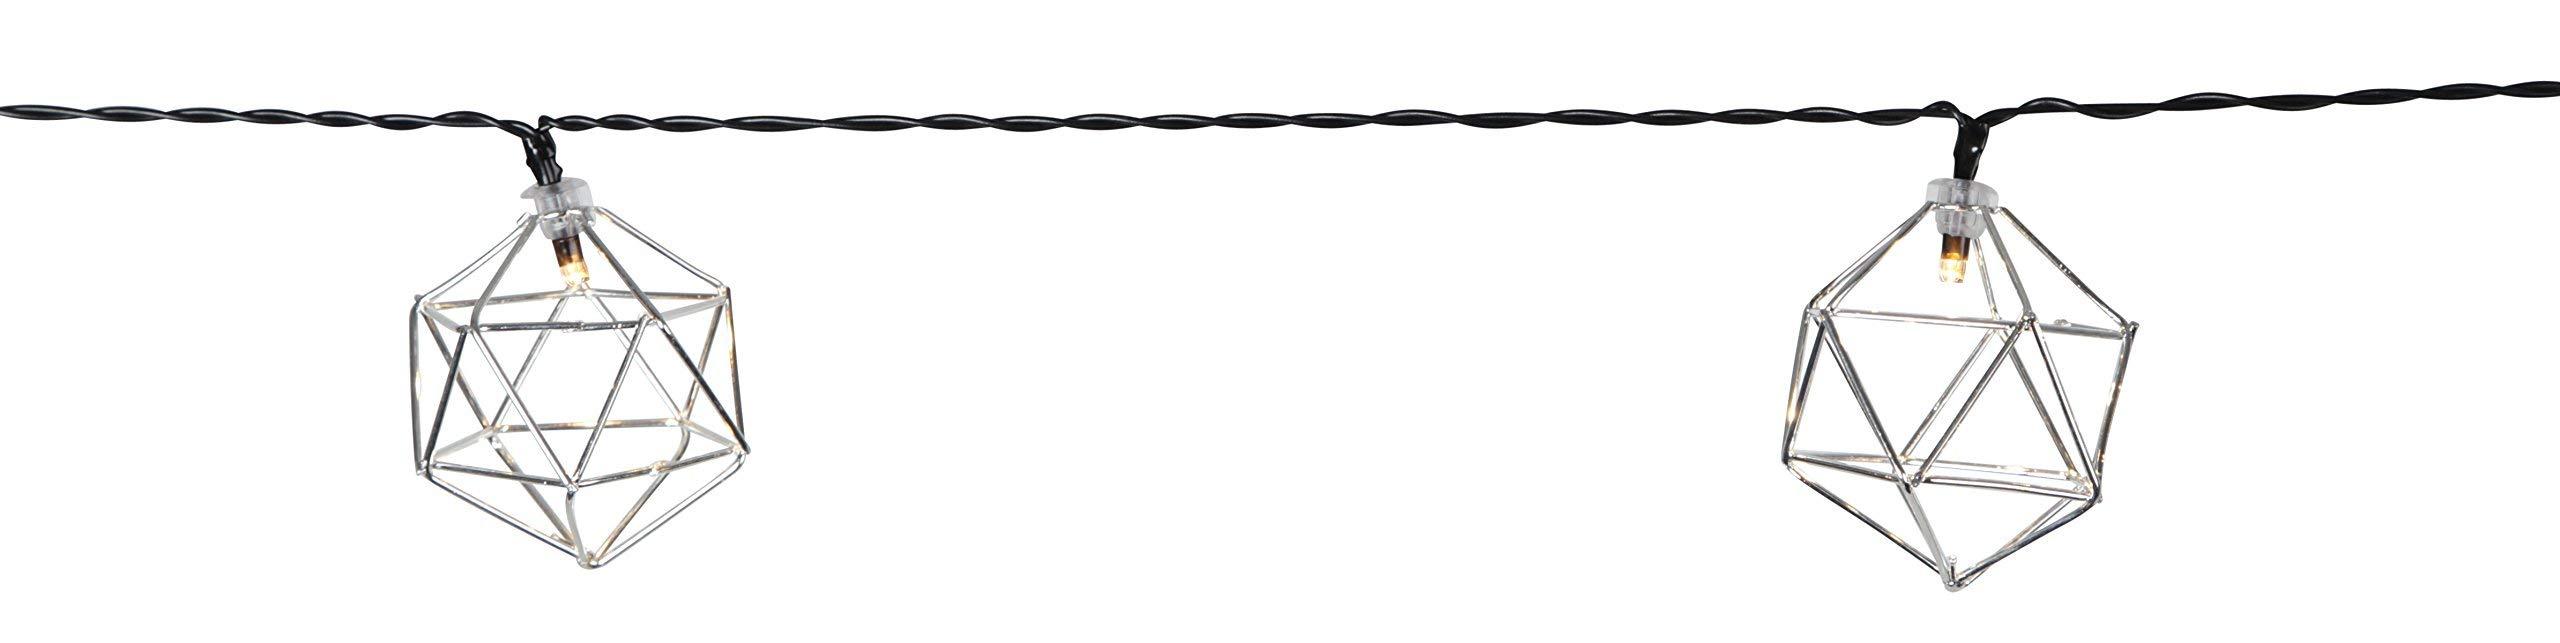 LED-Lichterkette-Edge-10-teilig-silberne-Ornamente-warmwhite-LED-schwarzes-Kabel-mit-Trafo